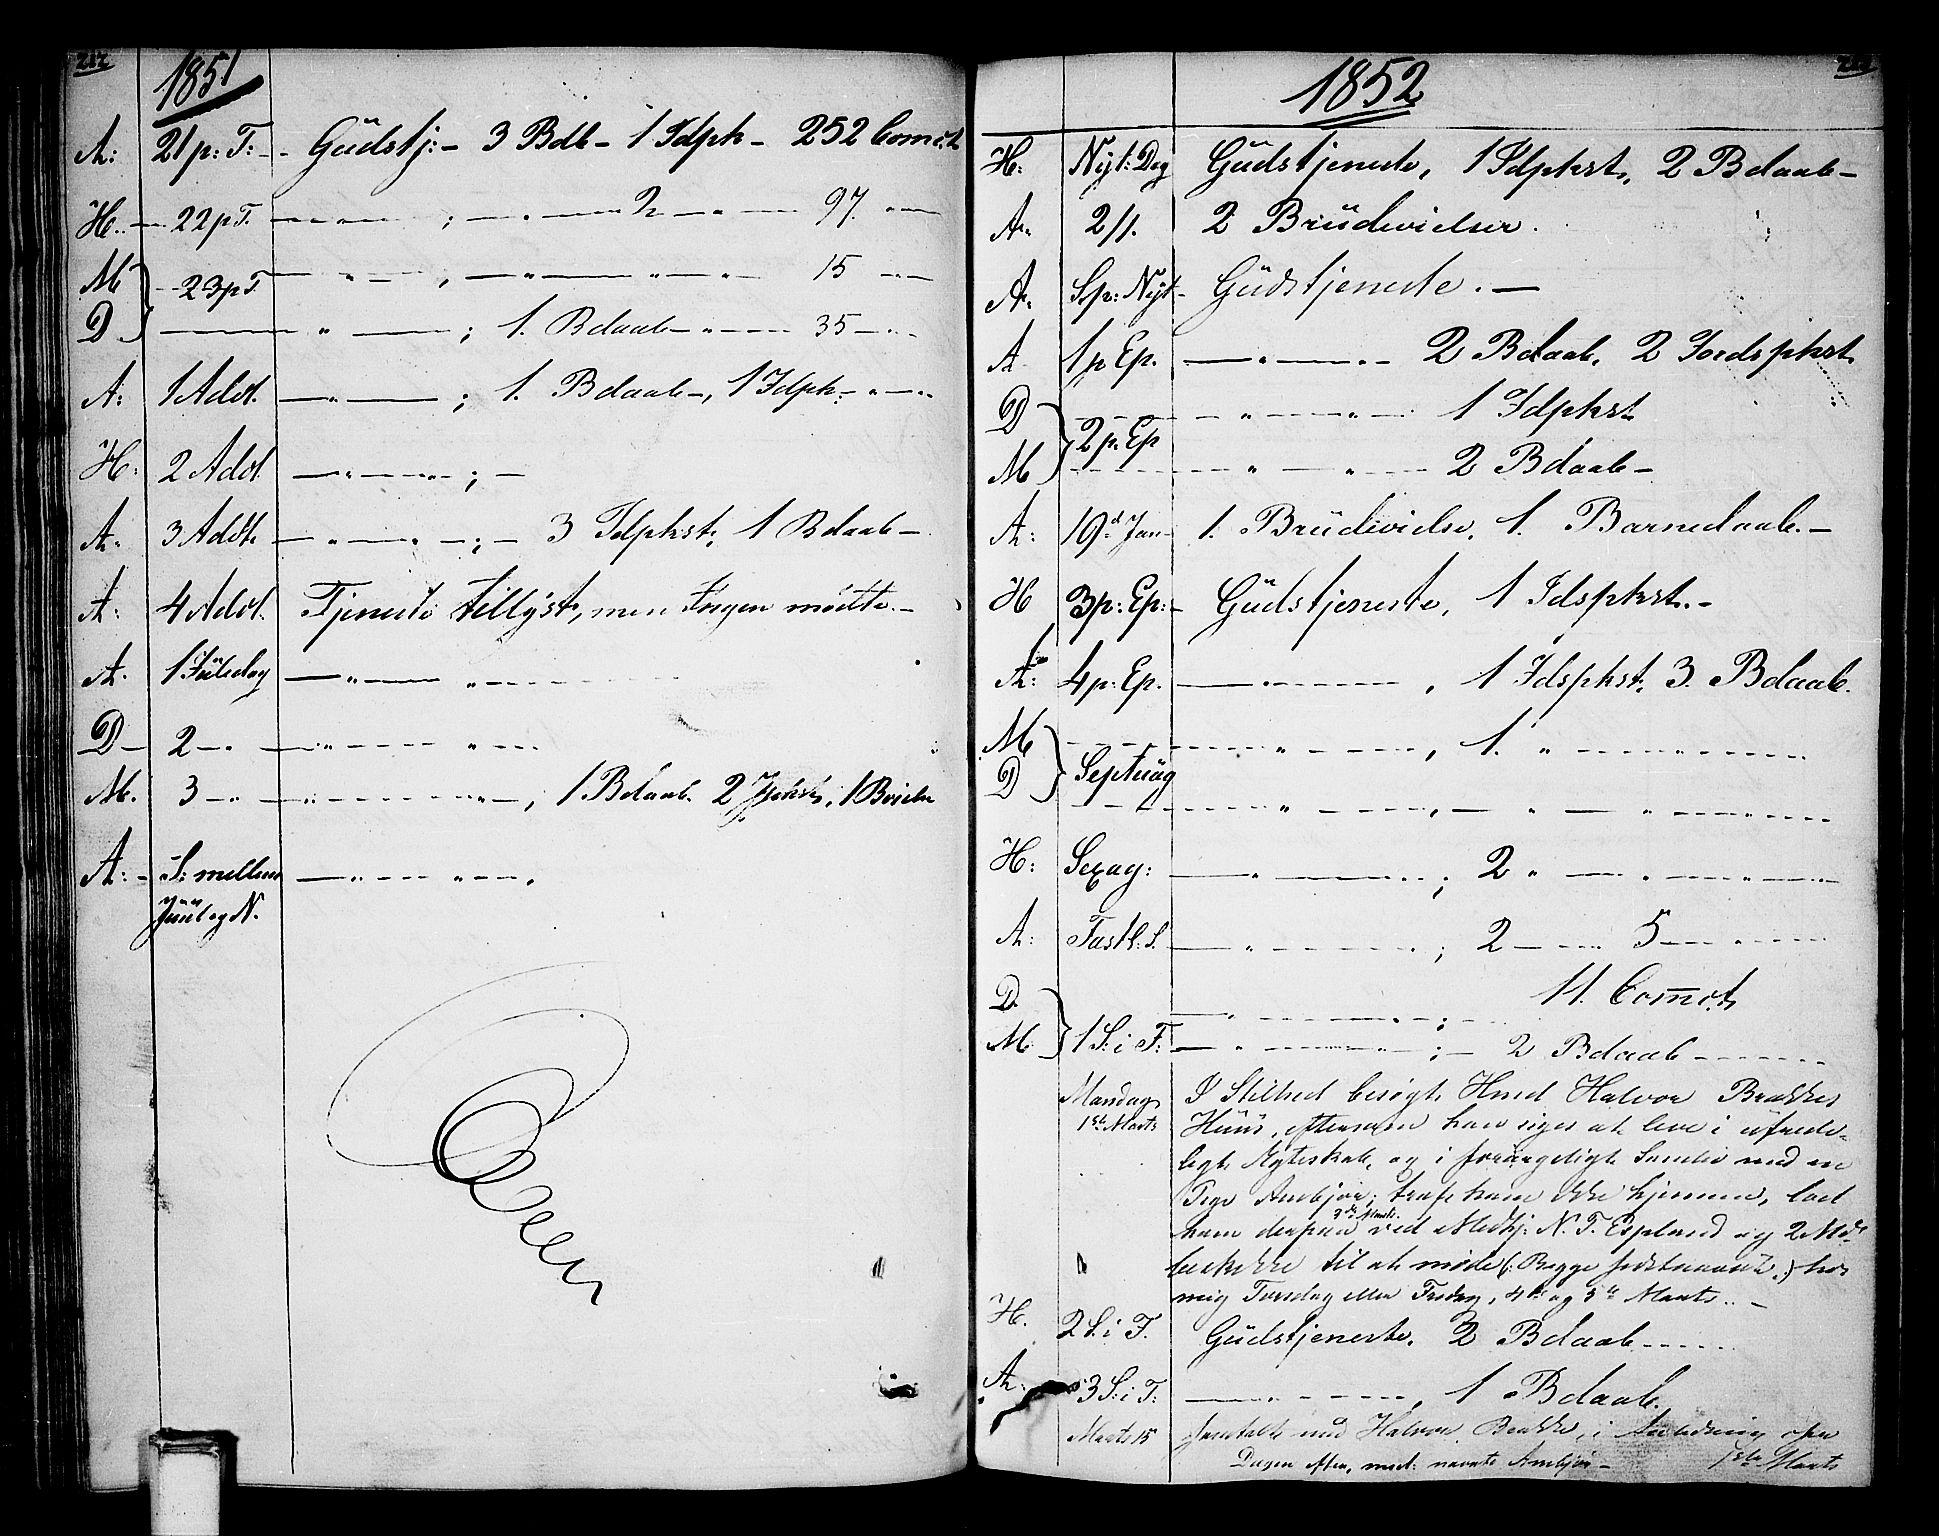 SAKO, Tinn kirkebøker, F/Fa/L0003: Ministerialbok nr. I 3, 1810-1814, s. 212-213